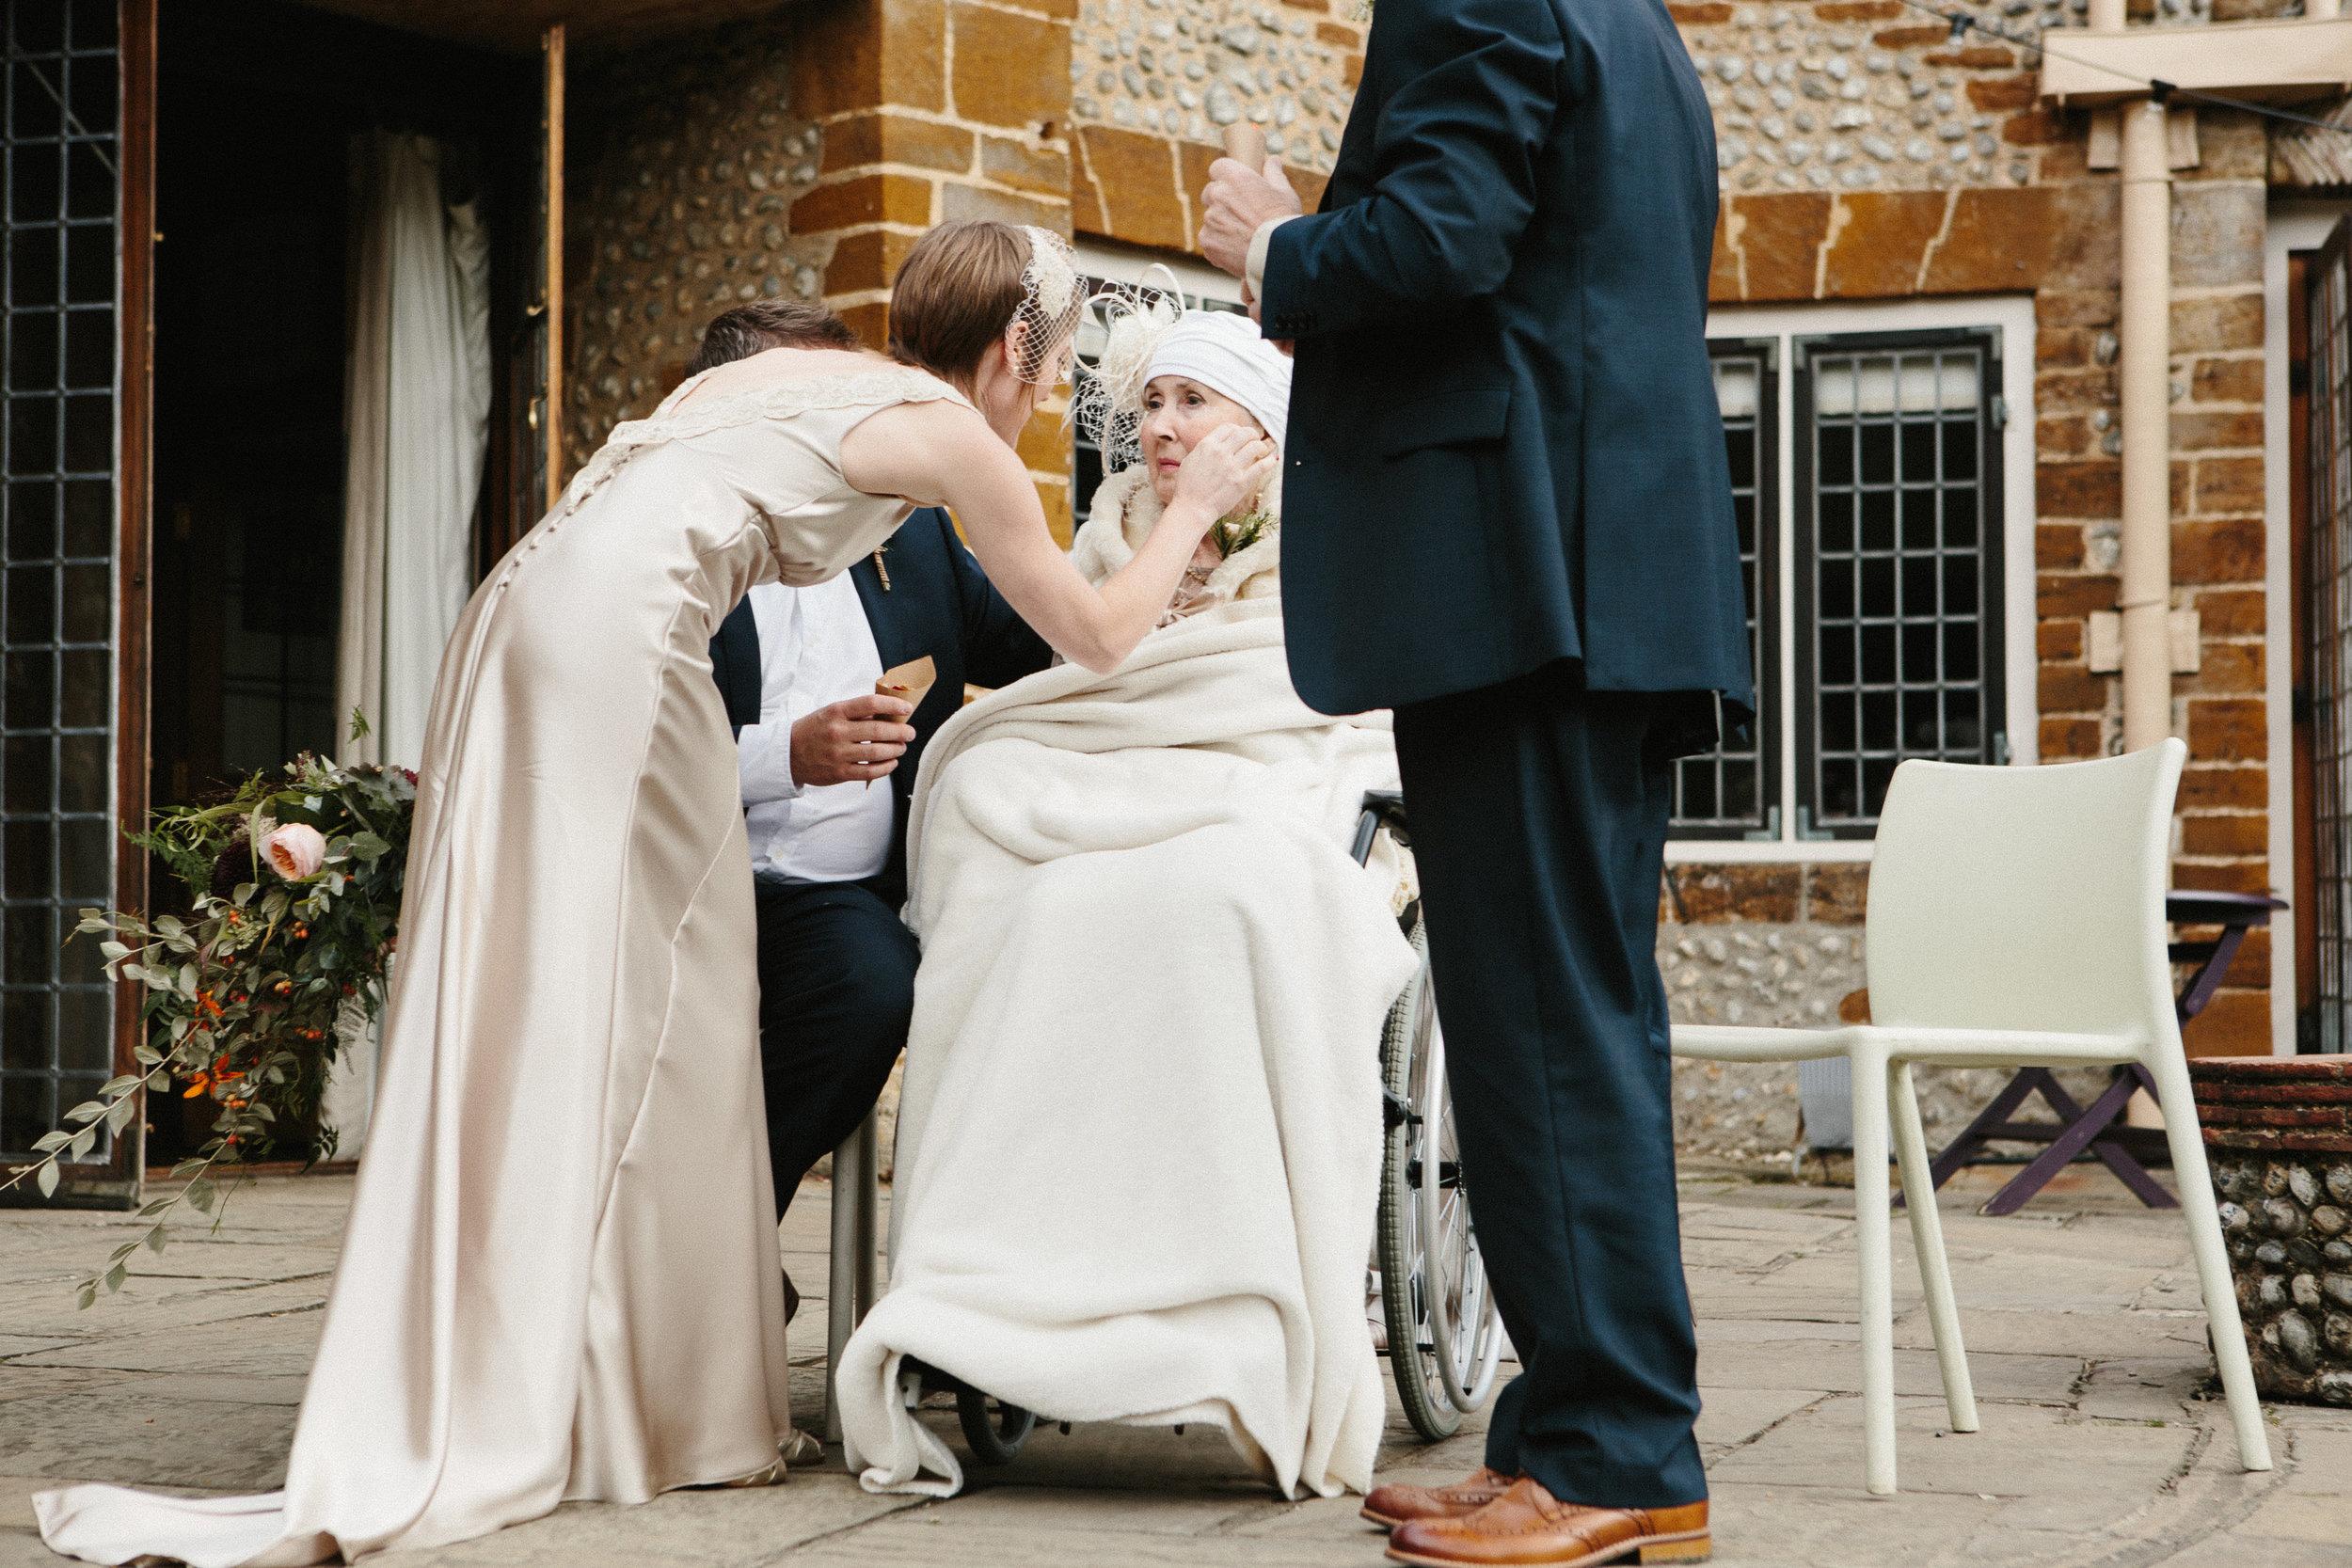 Kate-Beaumont-Sheffield-Honeysuckle-bias-cut-wedding-dress-oyster-Rosie14.jpg